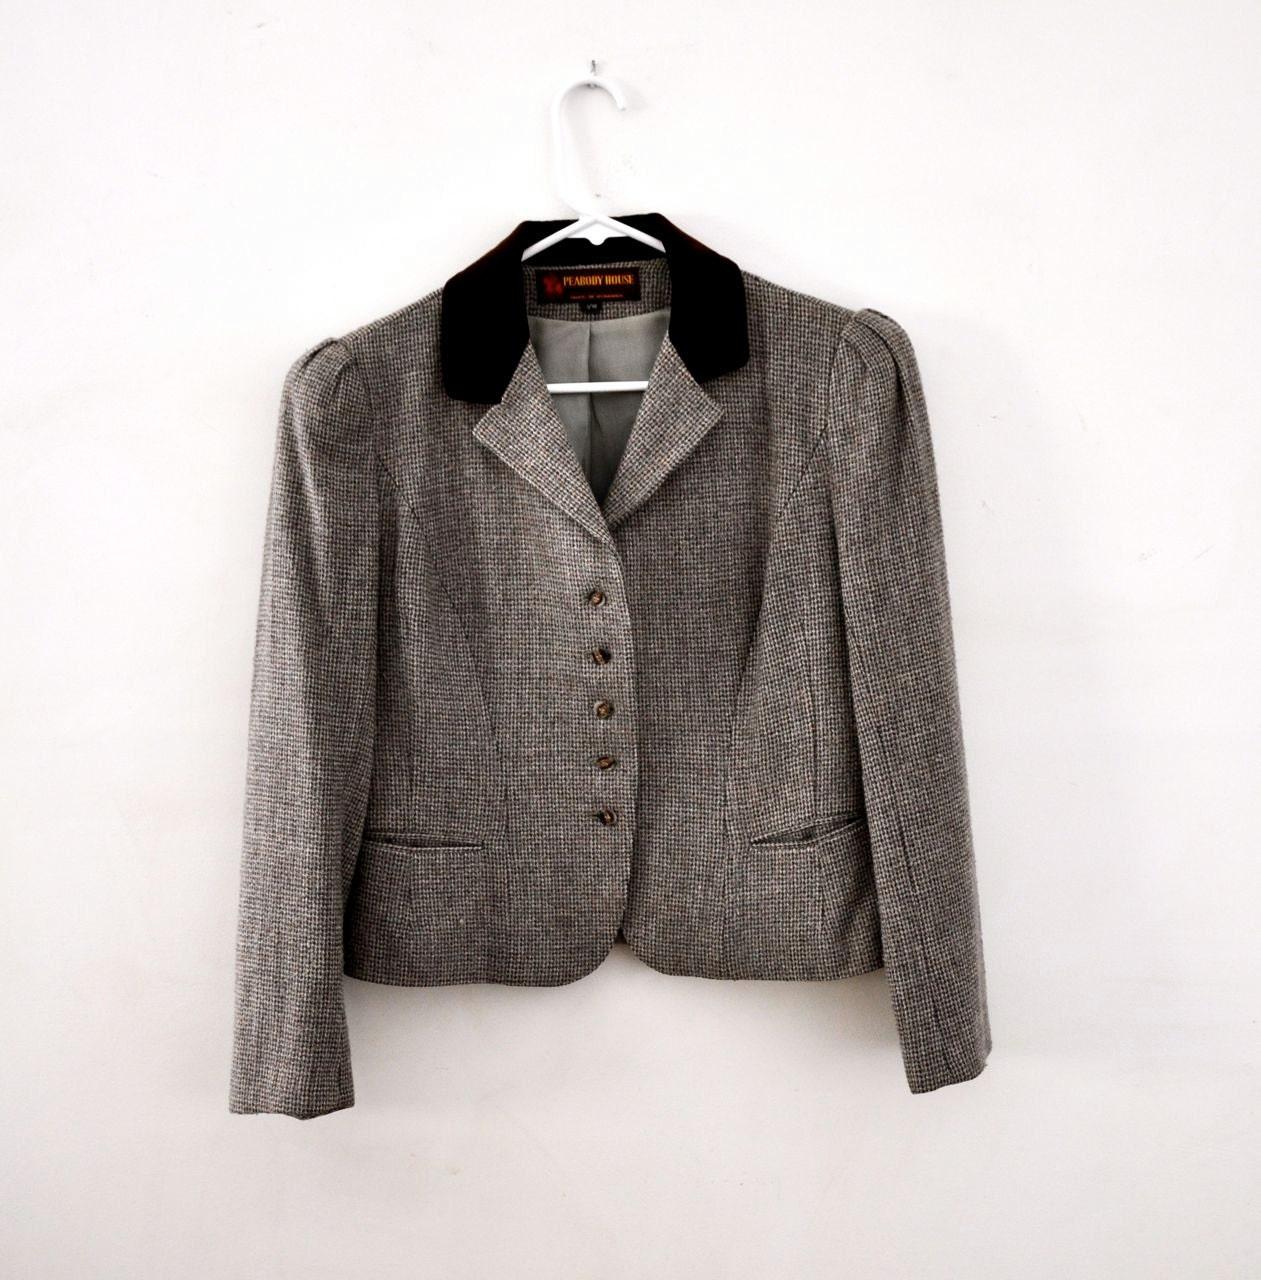 Vintage Riding Jacket 47